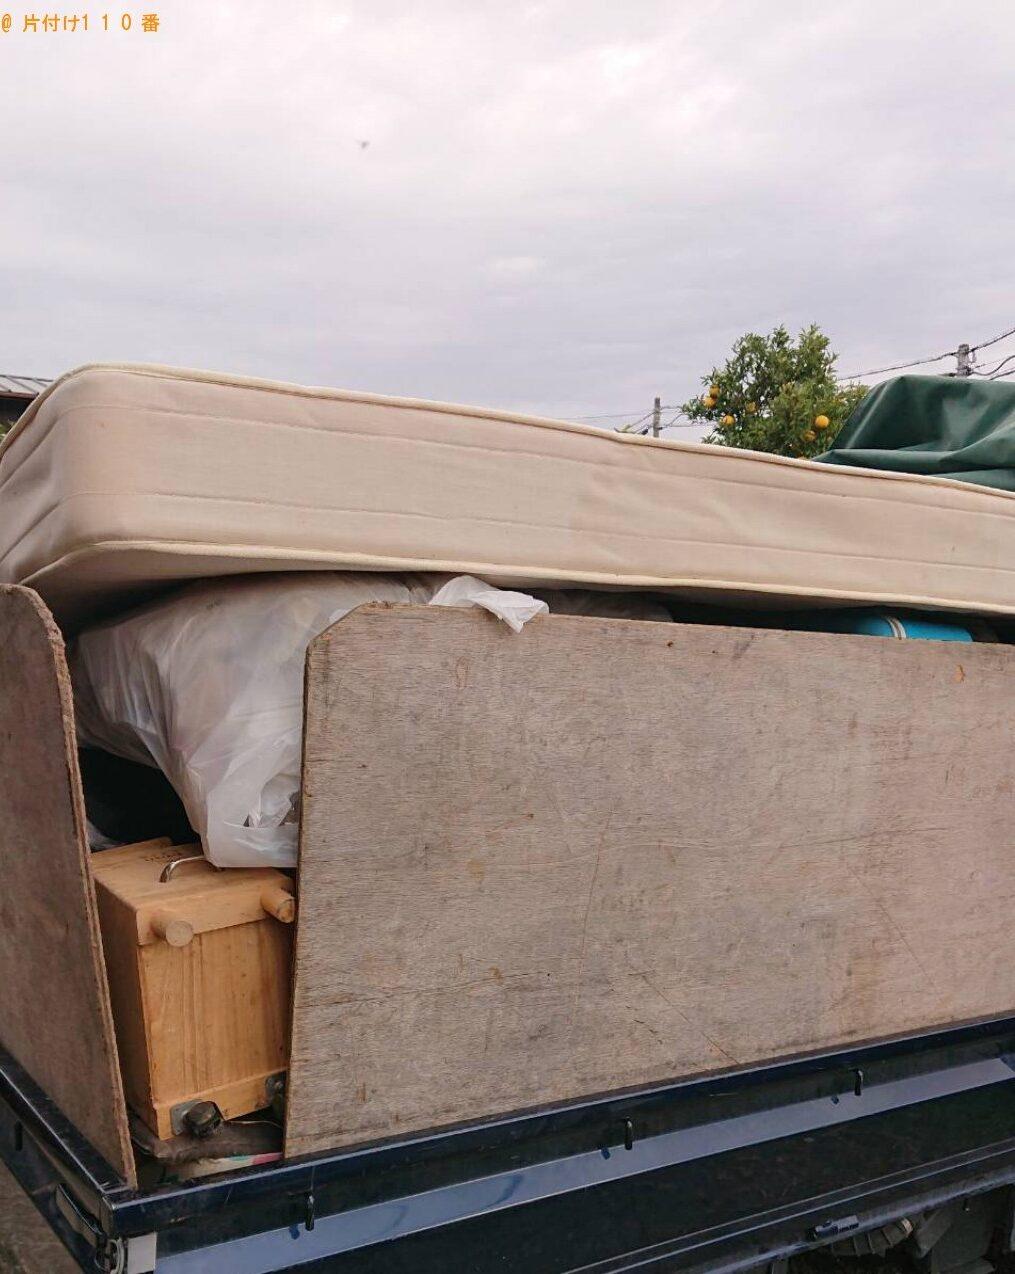 2tトラック1台程度の出張不用品の回収・処分ご依頼